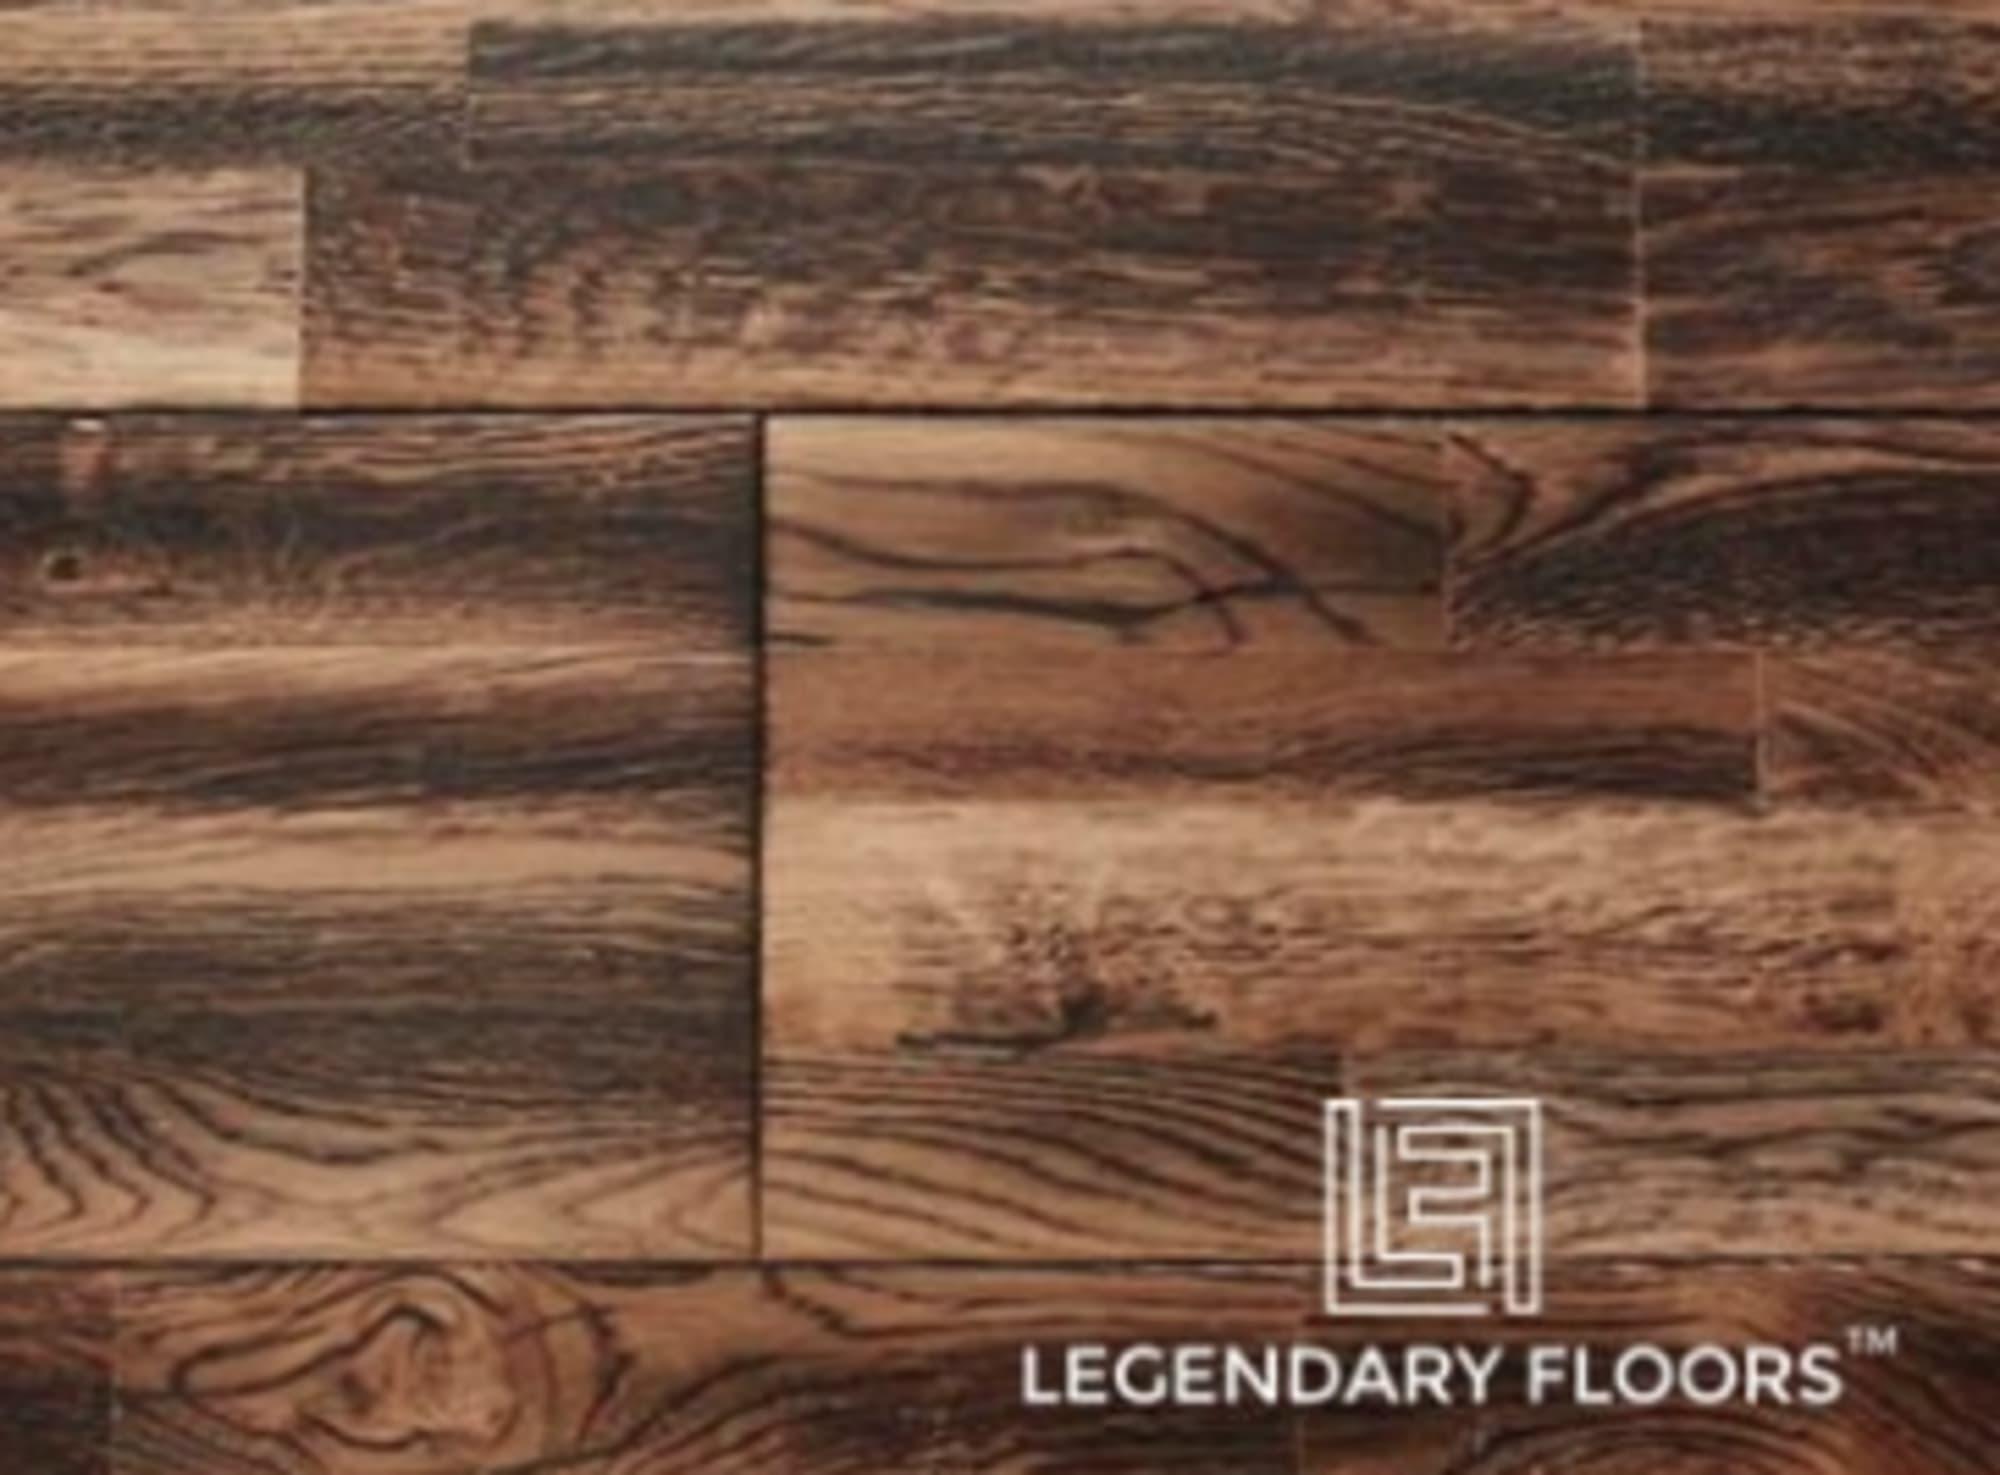 Legendary Floors - 3036 Parquet Dr Dalton, GA 30720